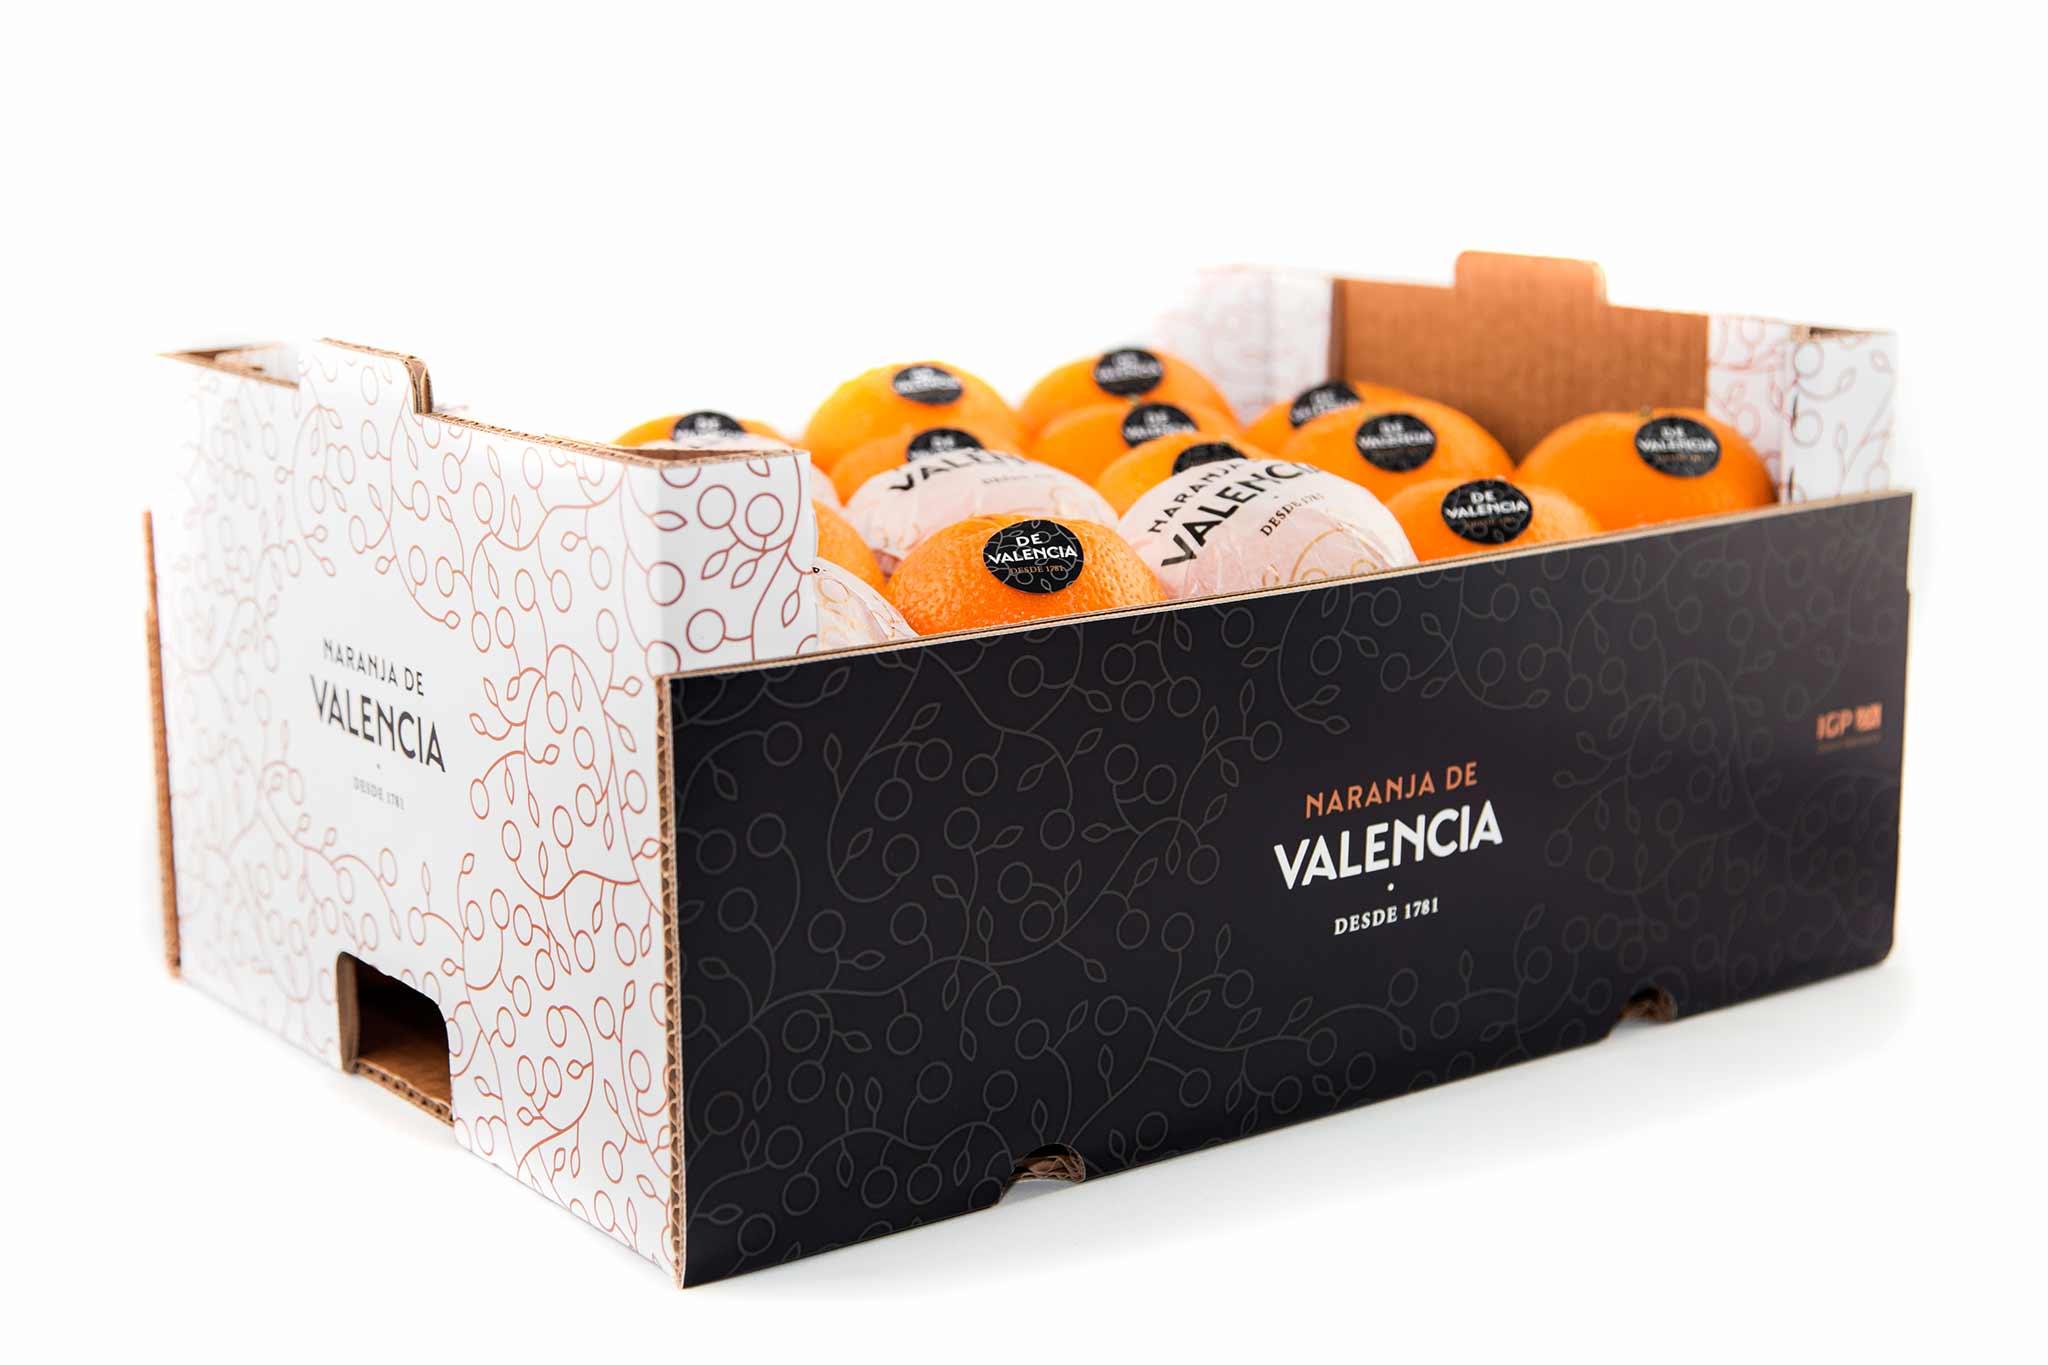 Packaging Naranja de Valencia - Valencia Orange